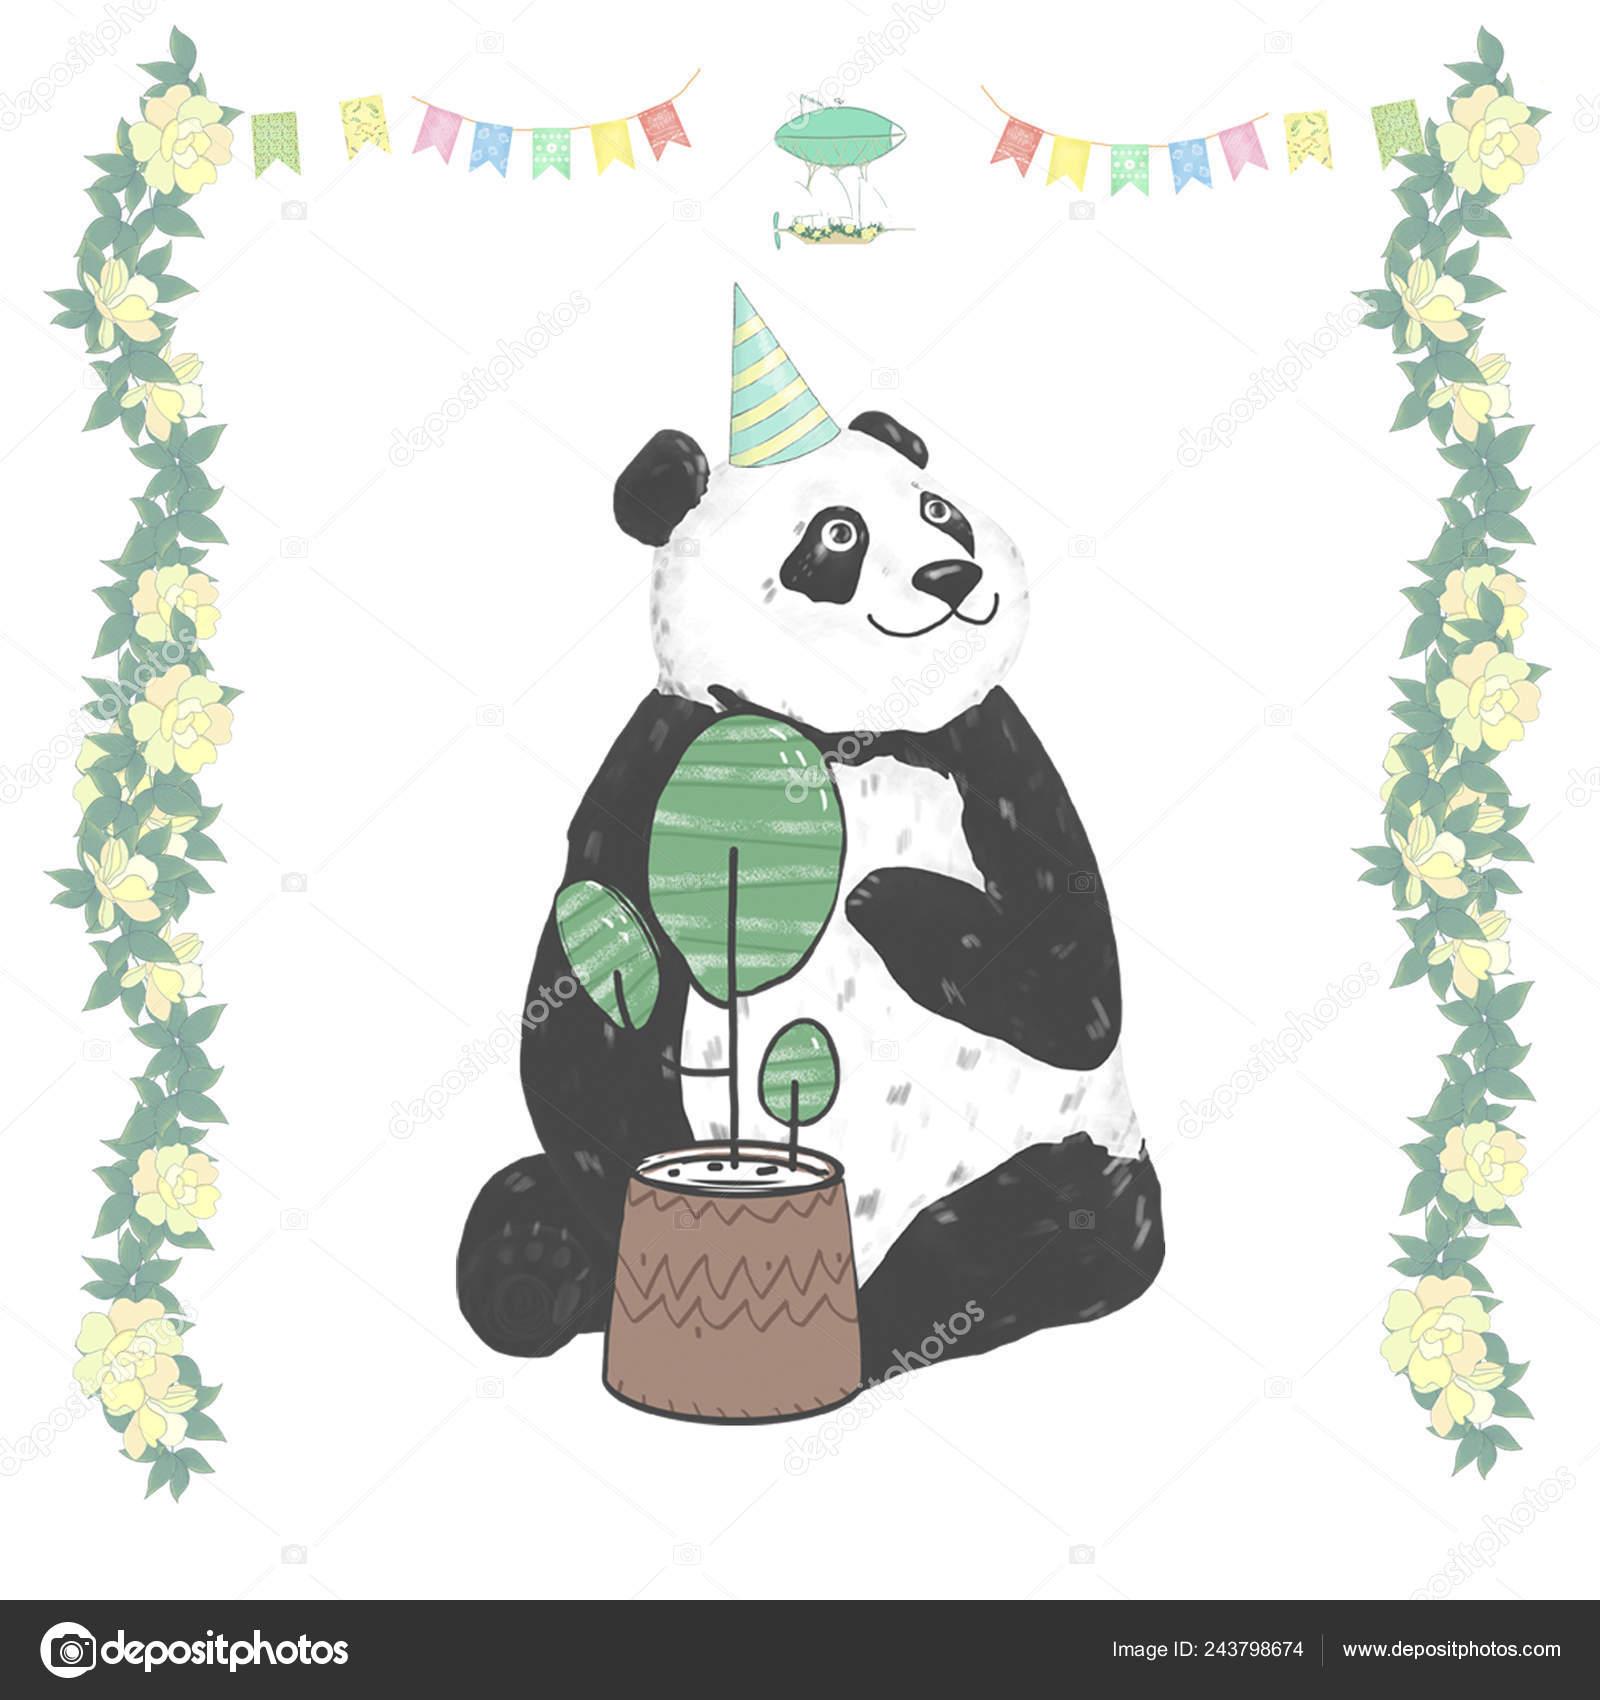 Panda Clip Art Drawing Animal Illustration Cute Animal Greeting